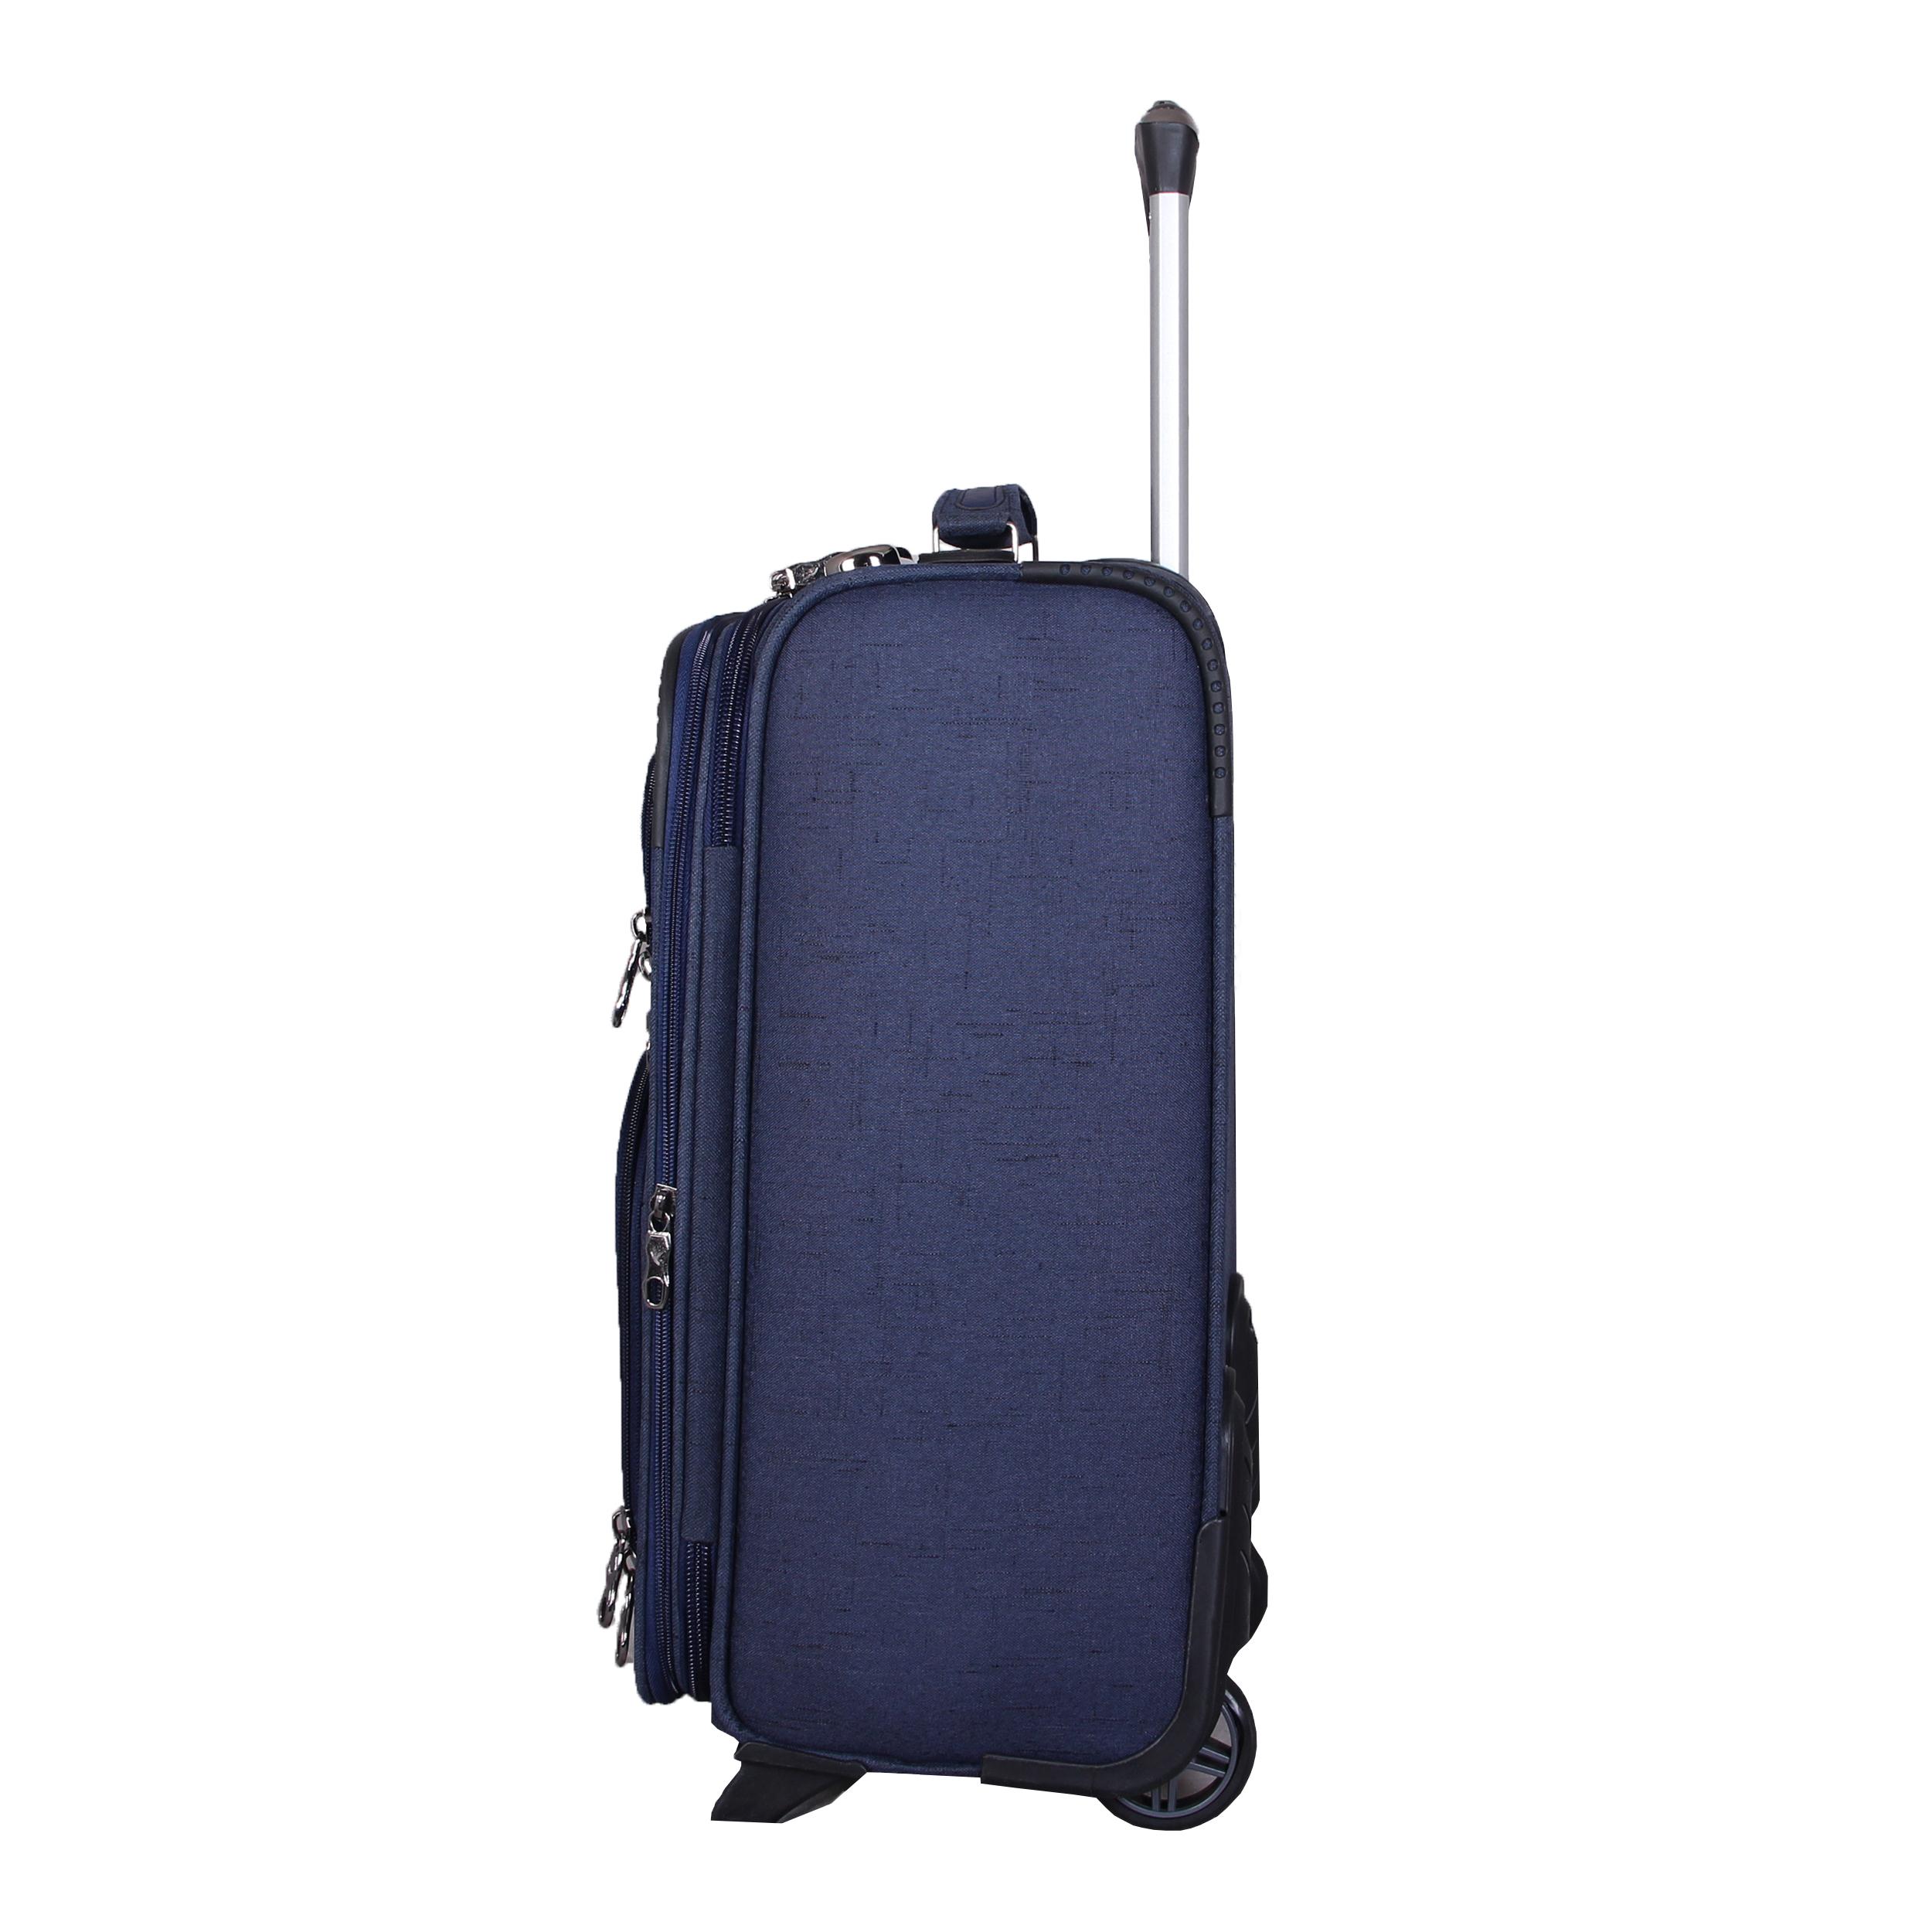 مجموعه سه عددی چمدان کد 2301A main 1 13